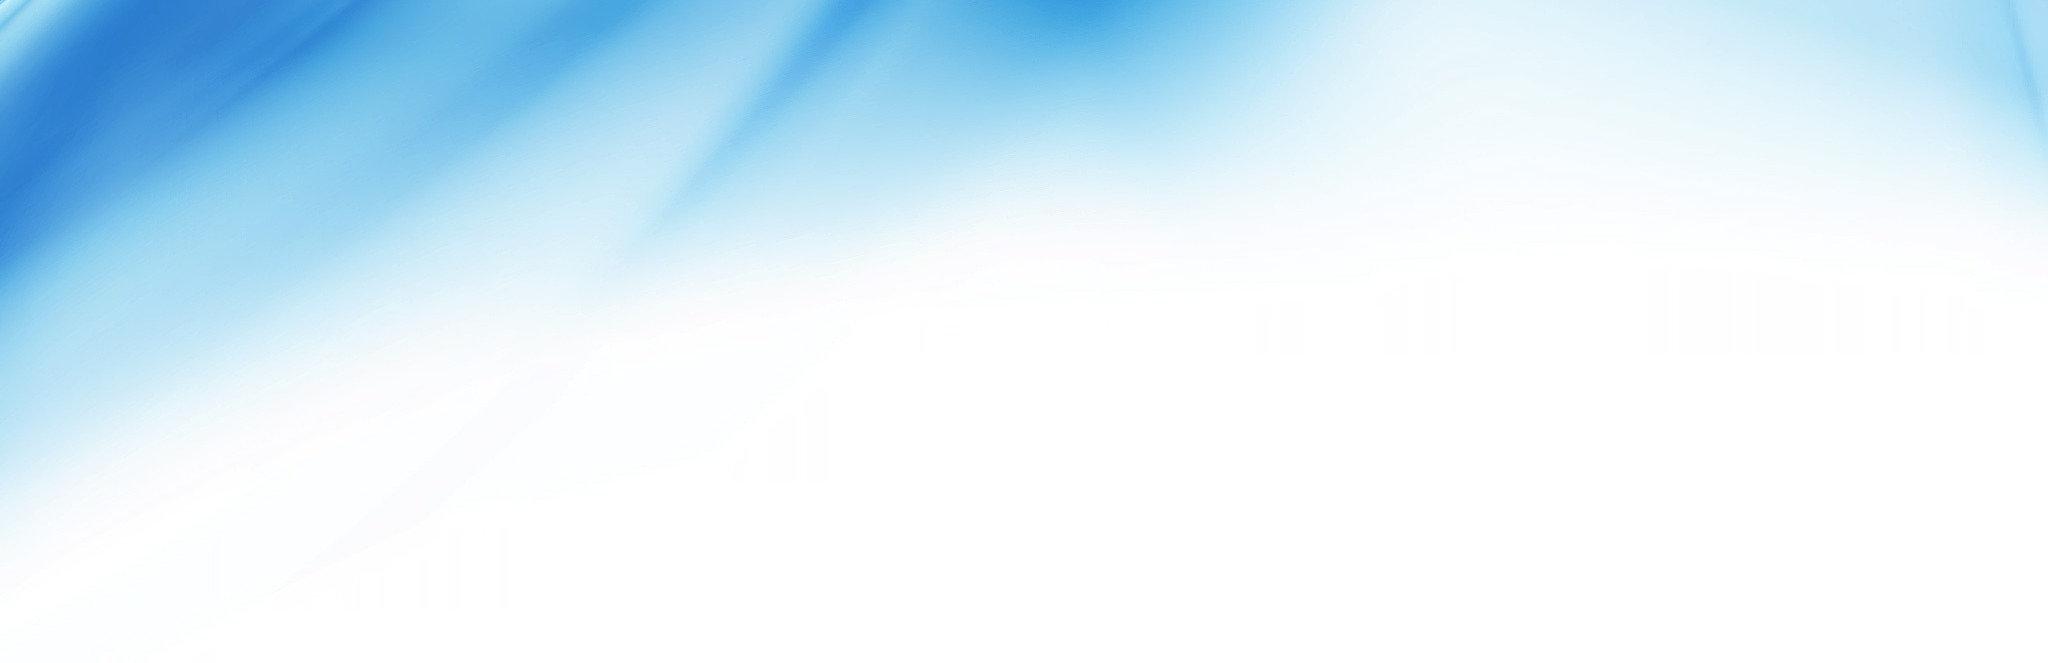 blue background_edited.jpg